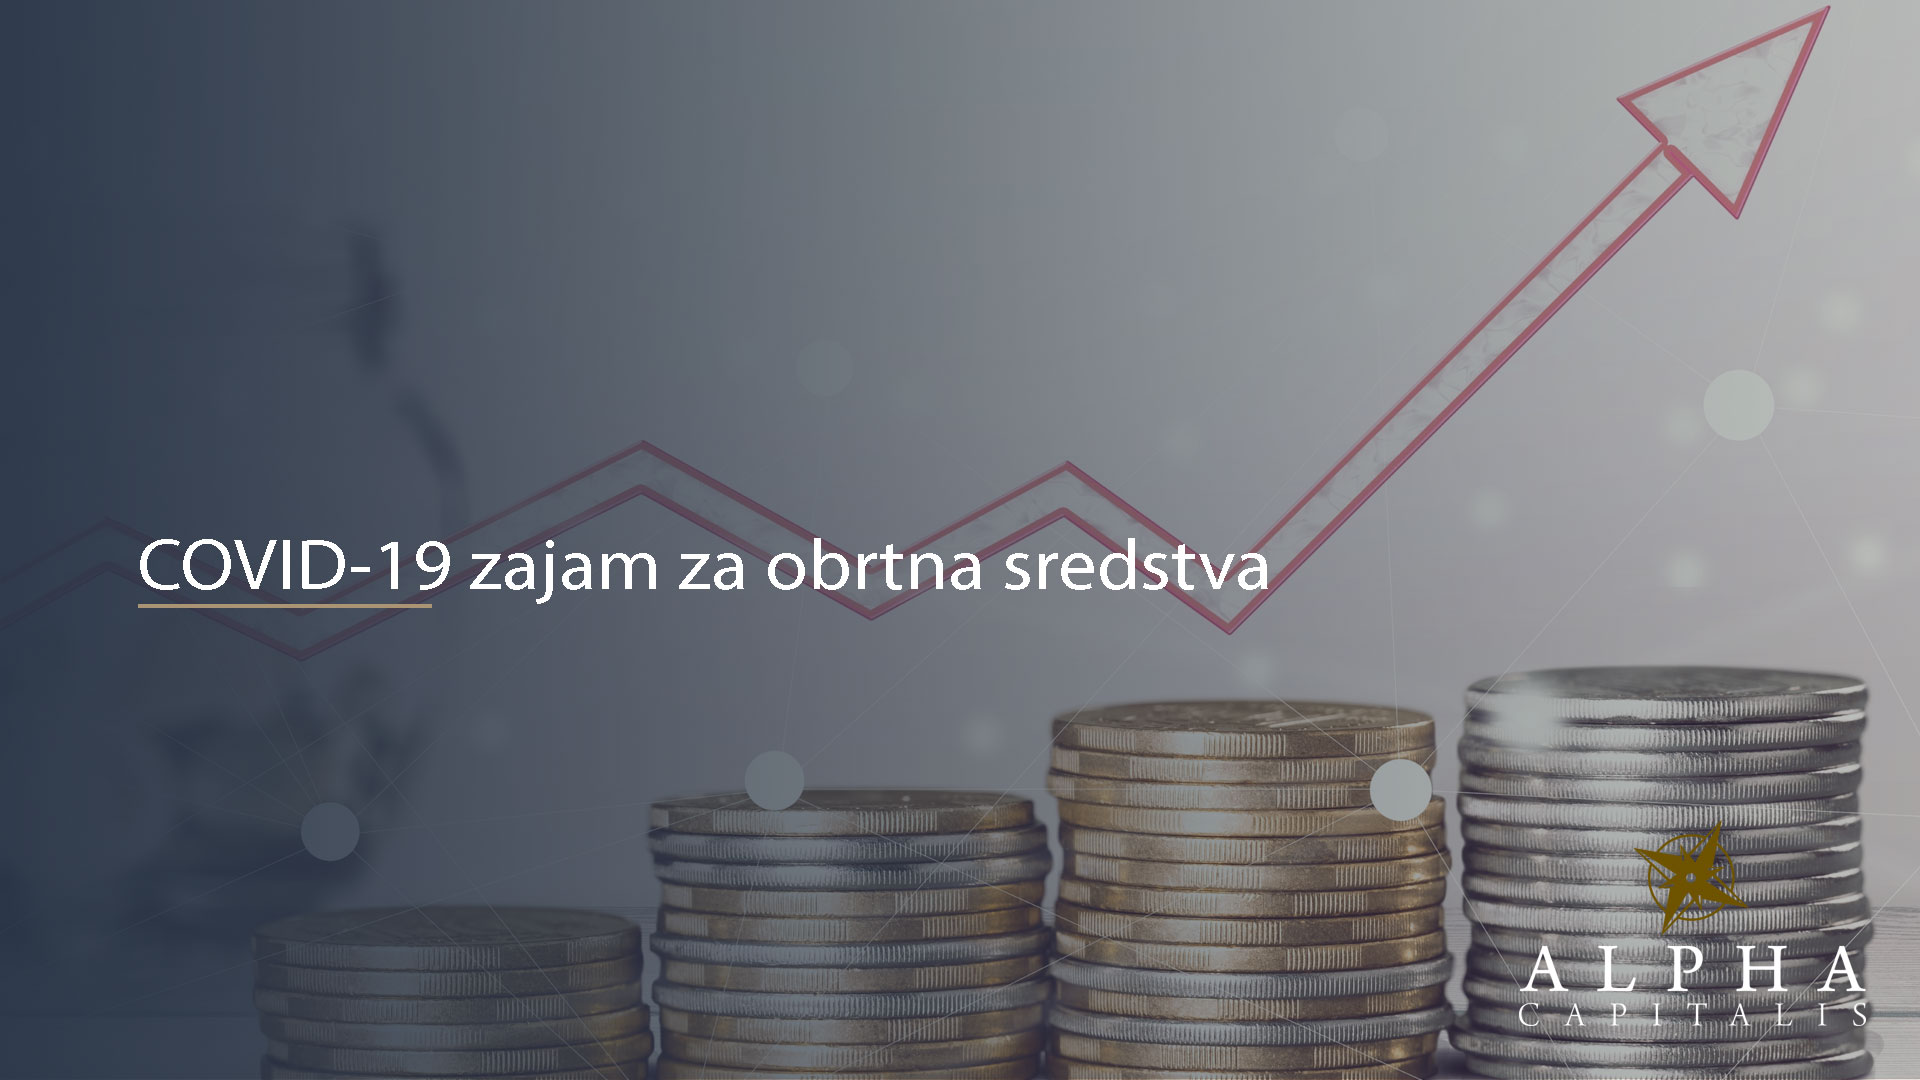 alpha-capitalis-novosti-covid19 zajam